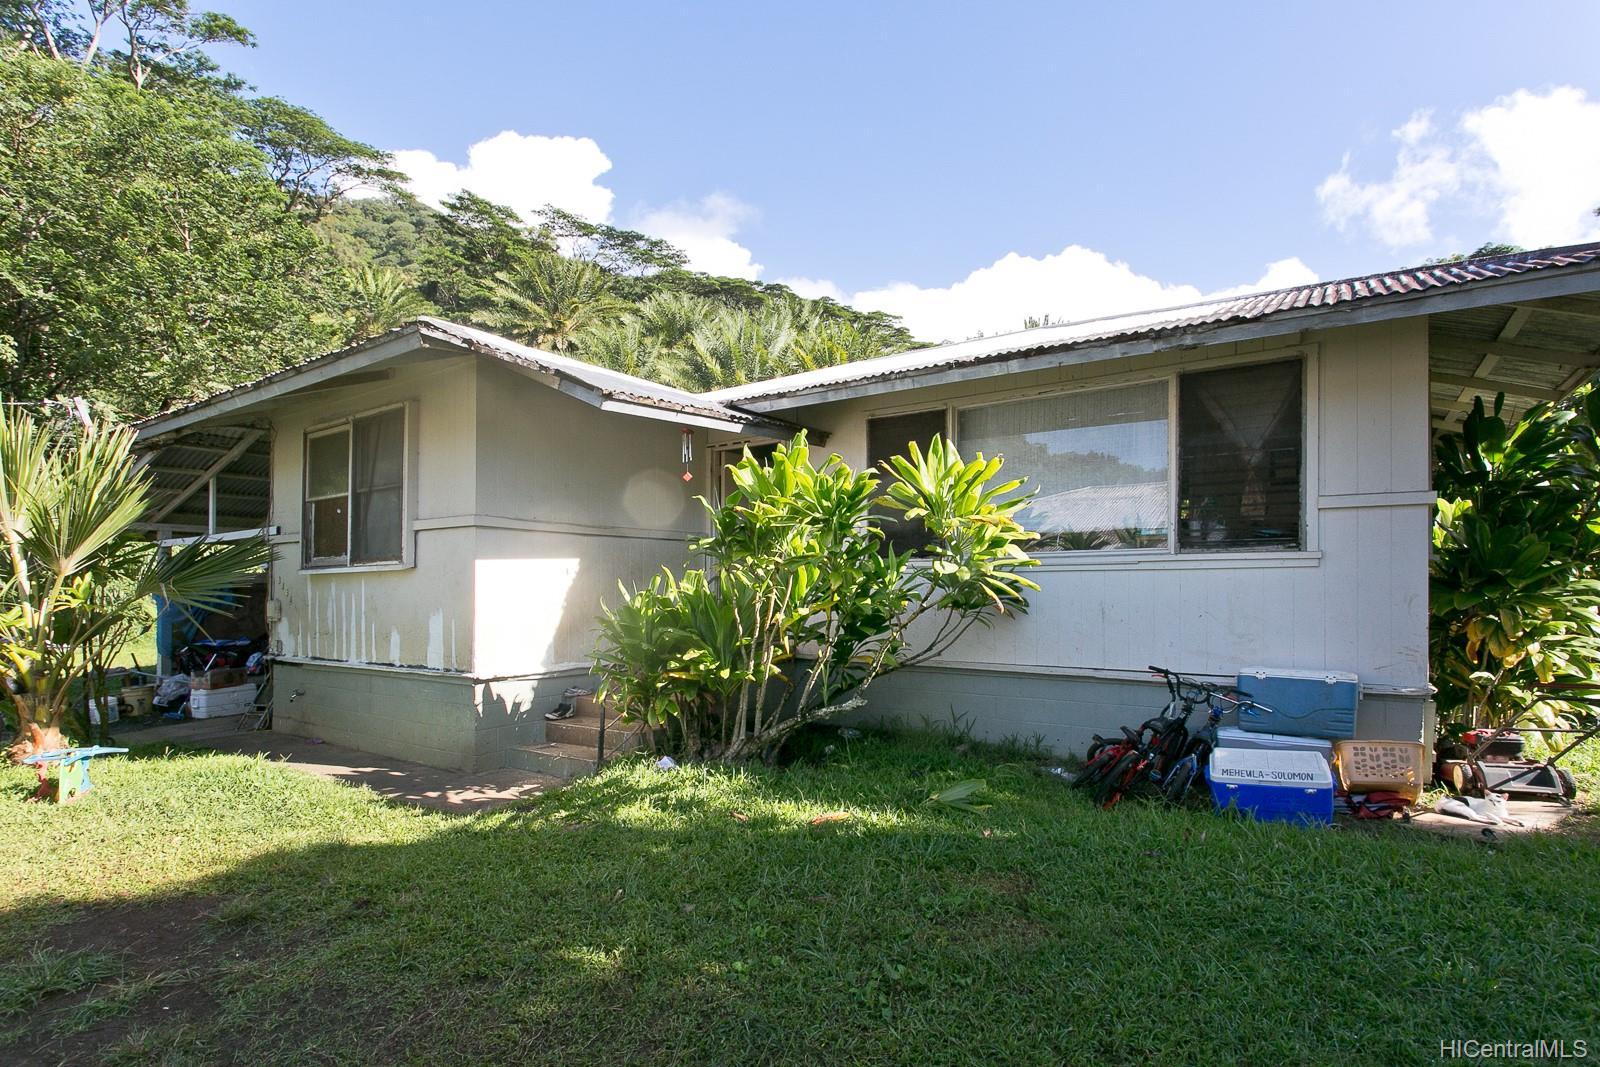 3434 Kalihi Street Honolulu - Multi-family - photo 6 of 20